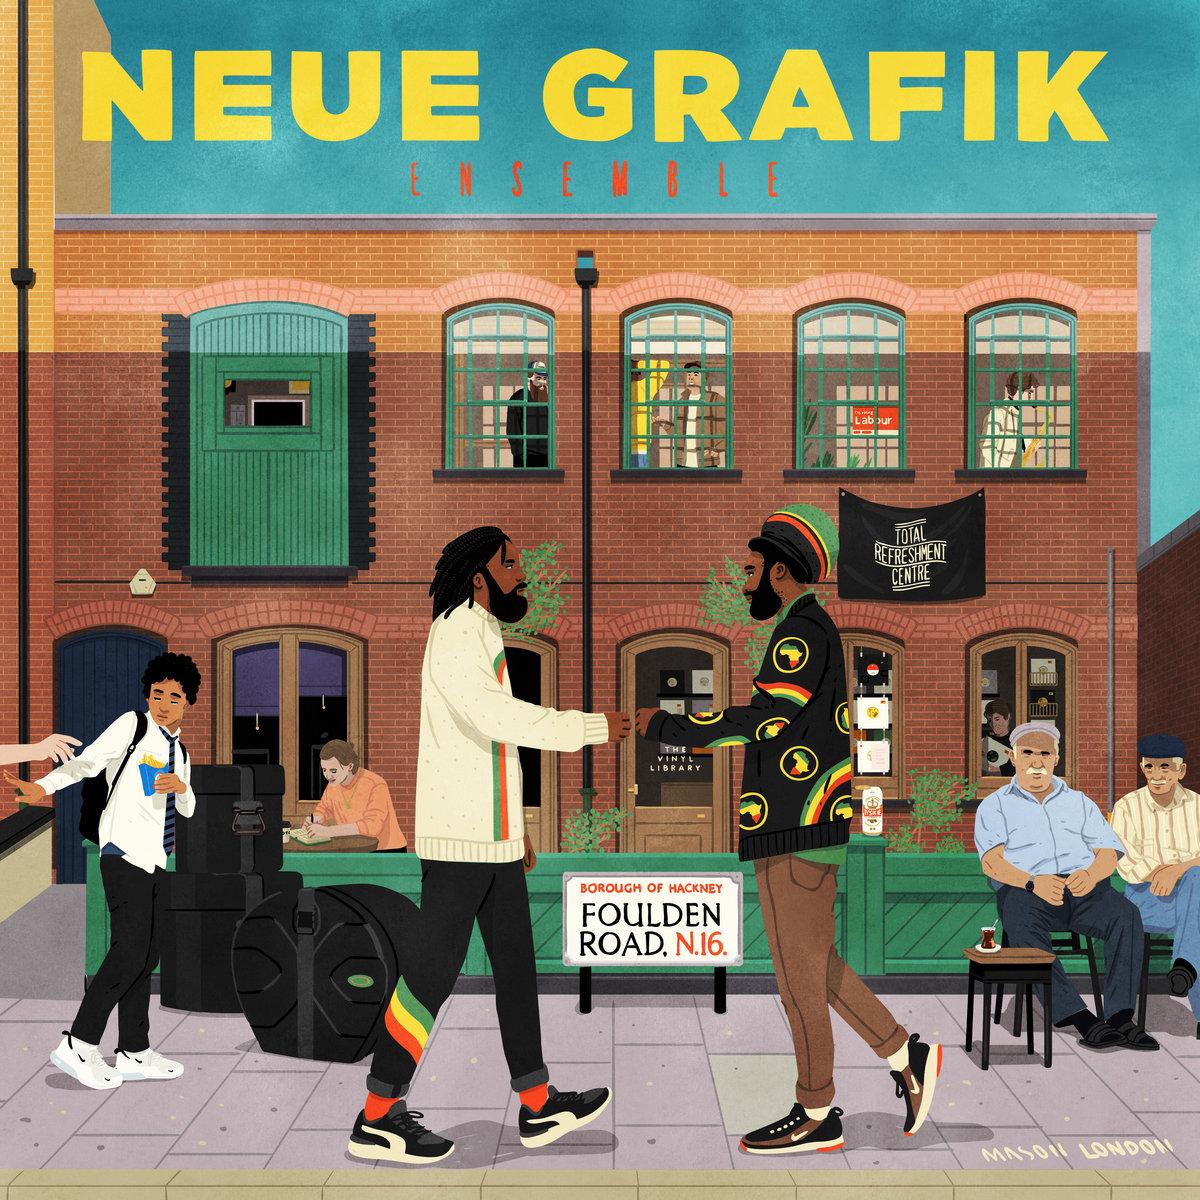 Total Refreshment Centre releasing Neue Grafik Ensemble's Foulden Road